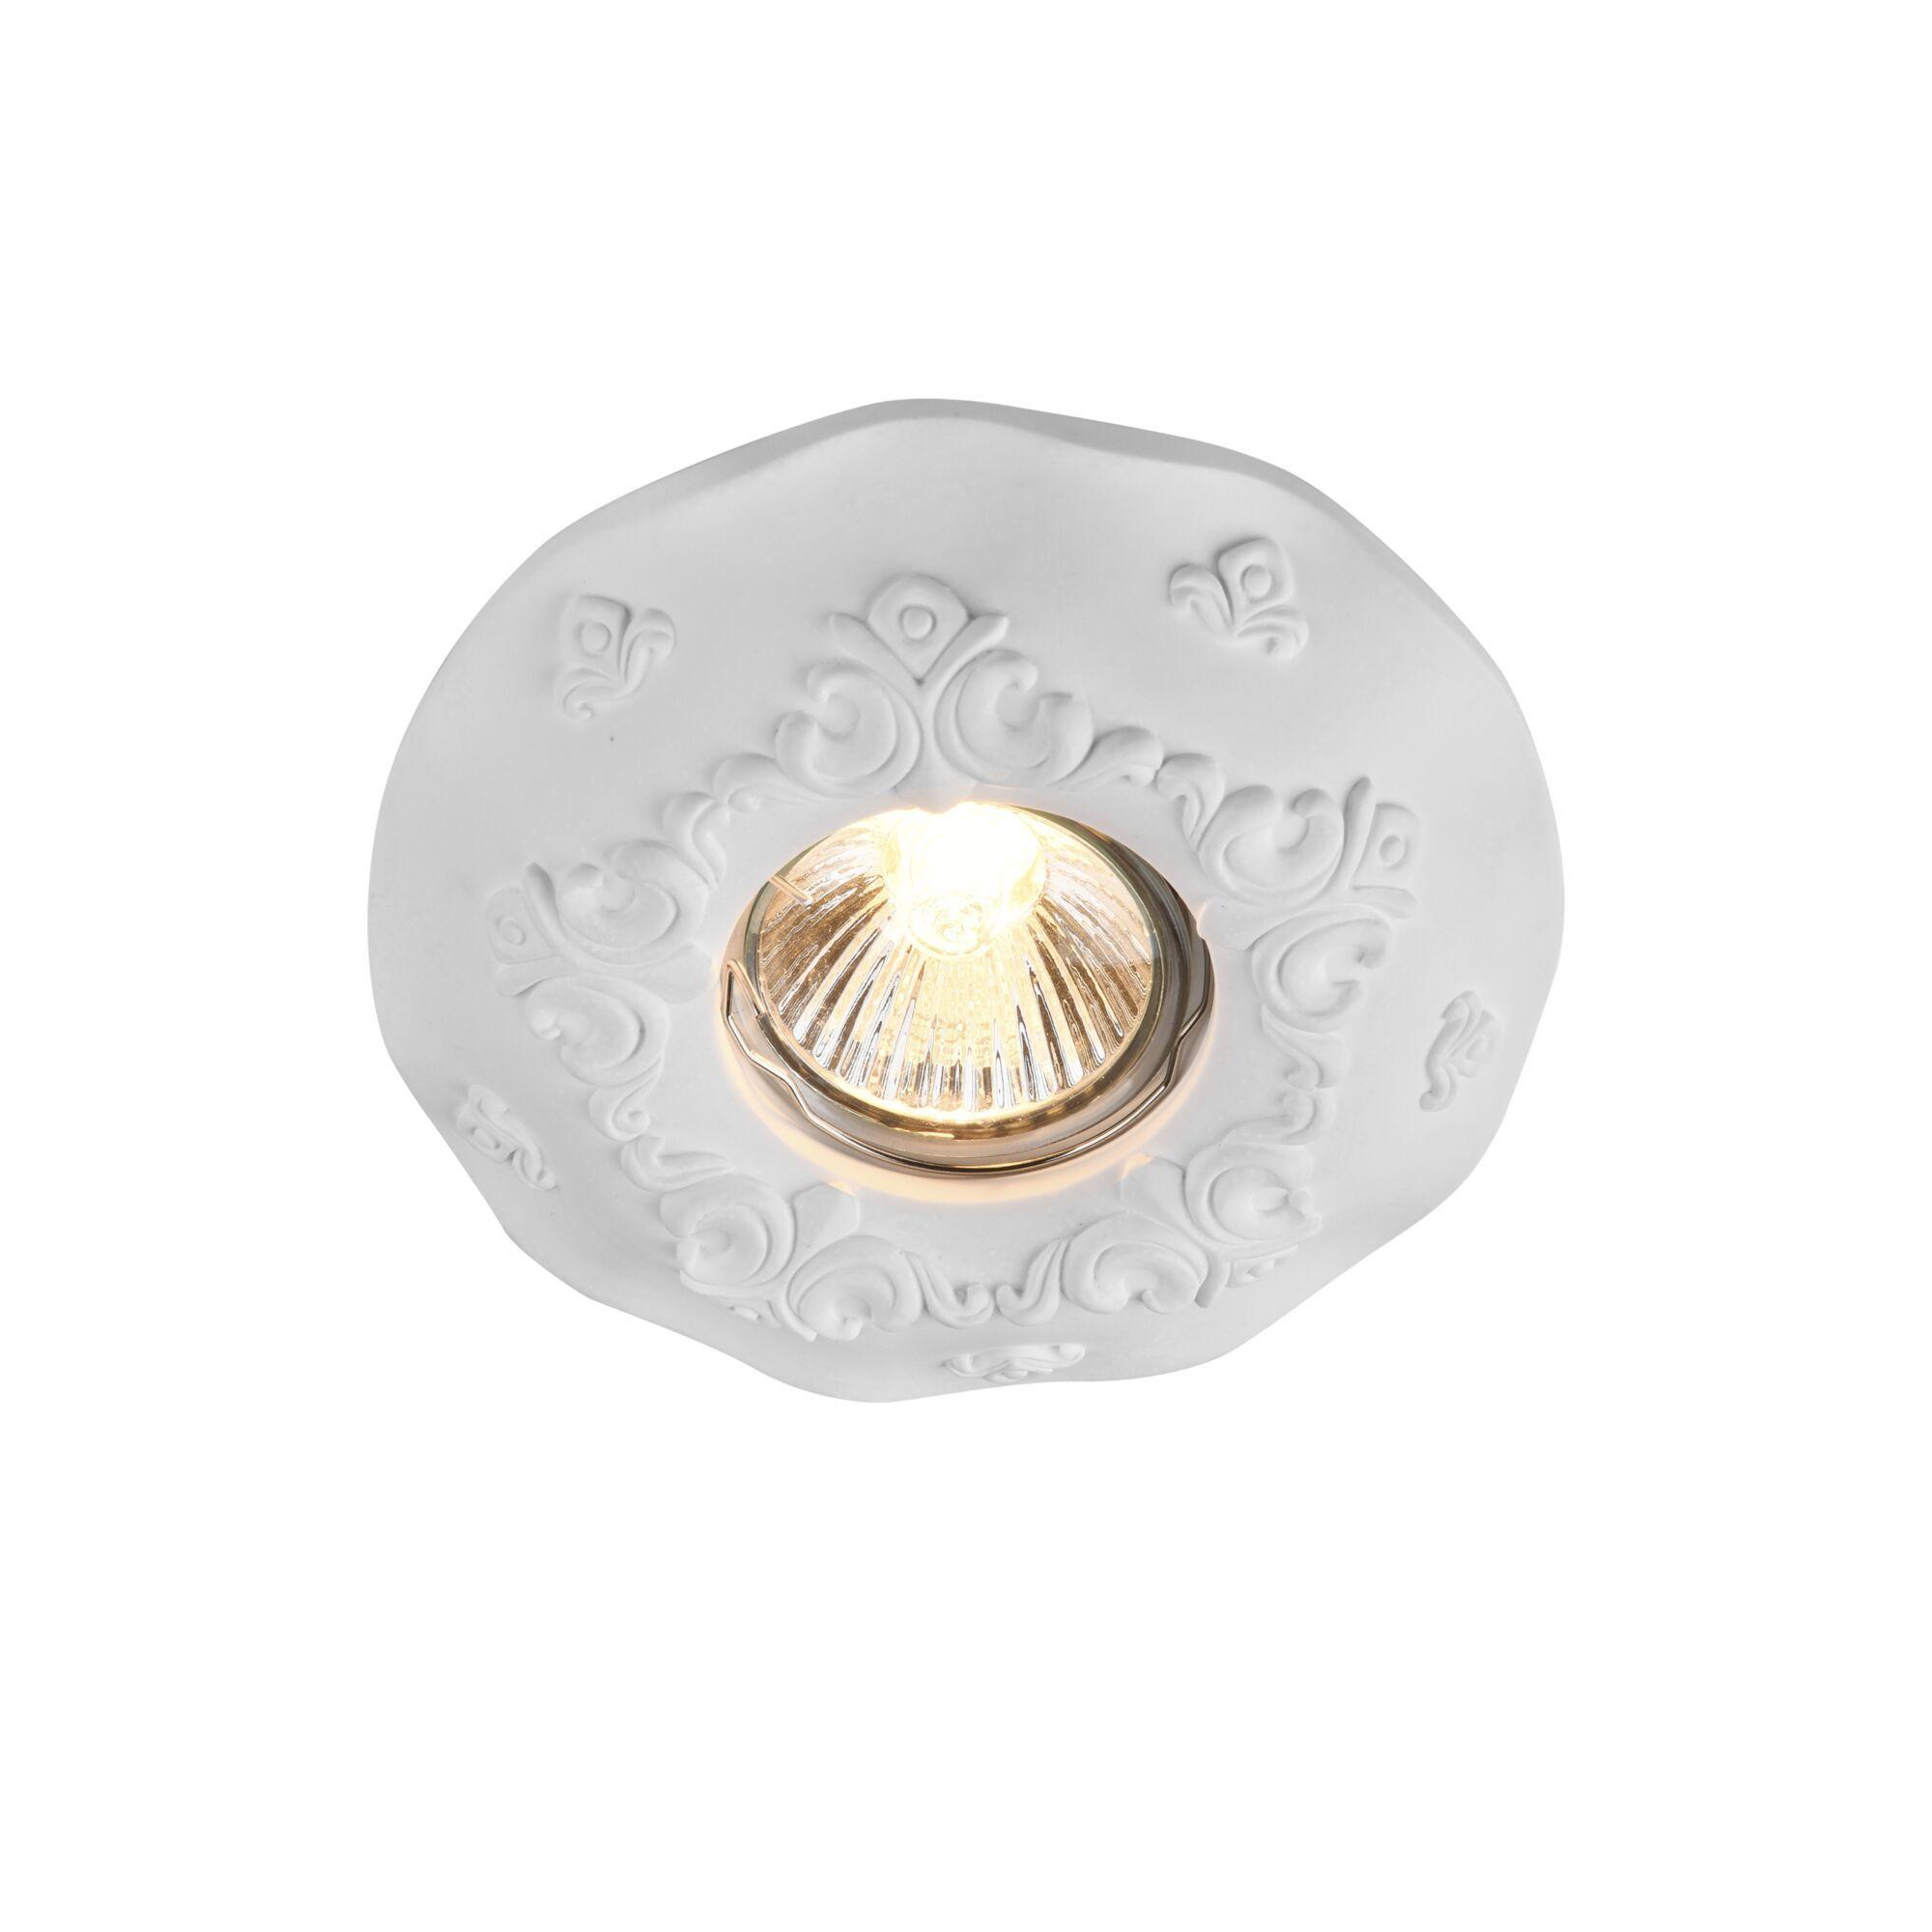 Встраиваемый светильник Maytoni Gyps Classic DL284-1-01-W, 1xGU10x35W, белый, под покраску, гипс - фото 1